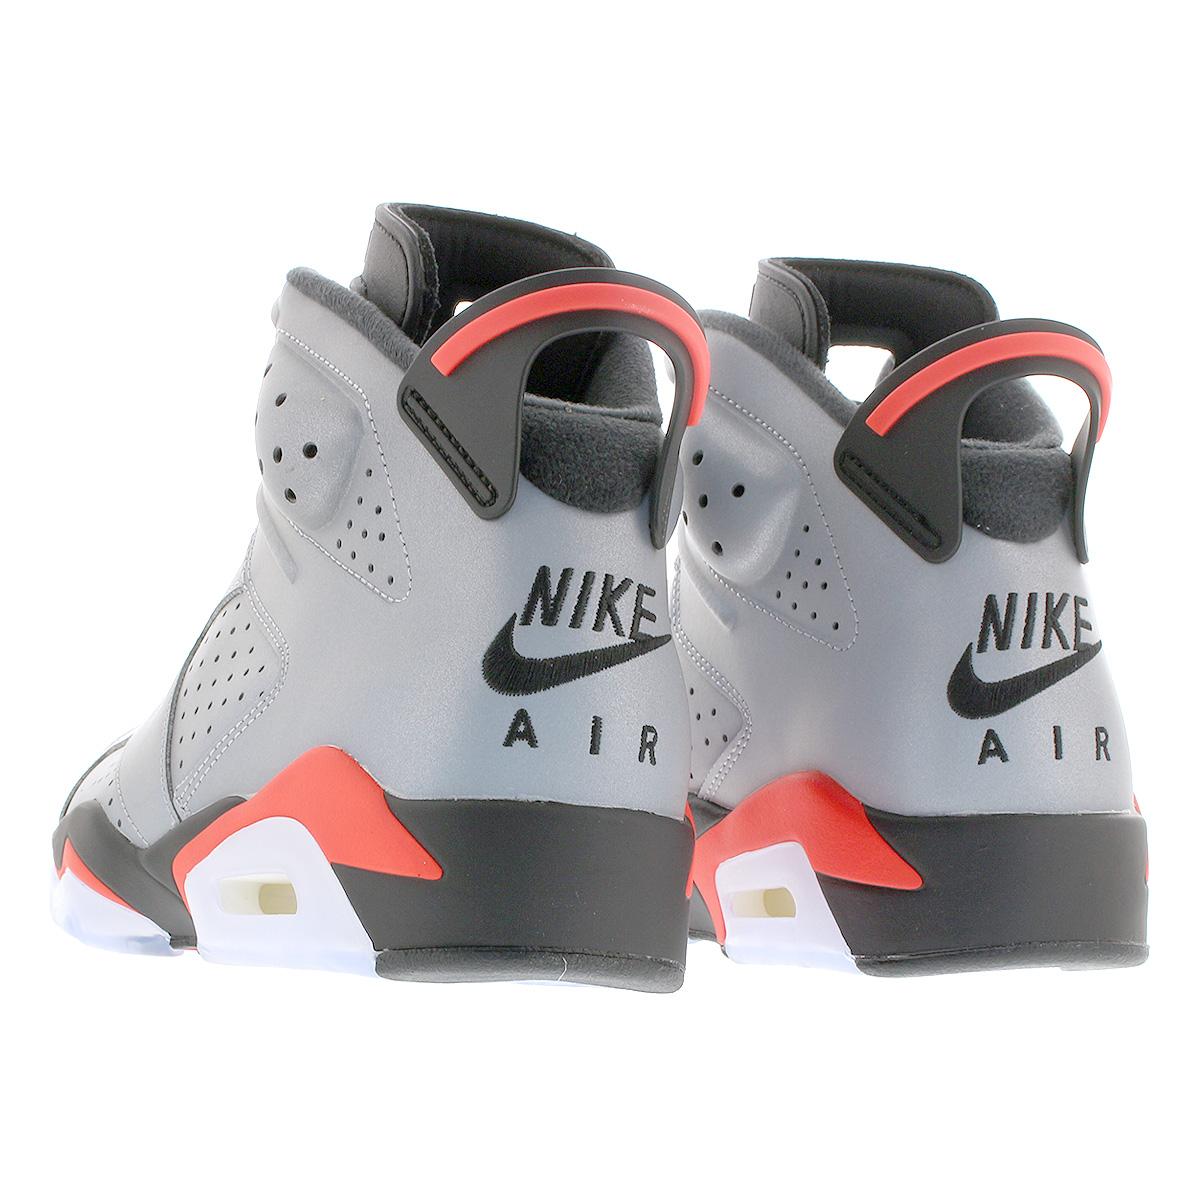 a98b0081cd4 ... NIKE AIR JORDAN 6 RETRO SP Nike Air Jordan 6 nostalgic SP REFLECT  SILVER/INFRARED ...